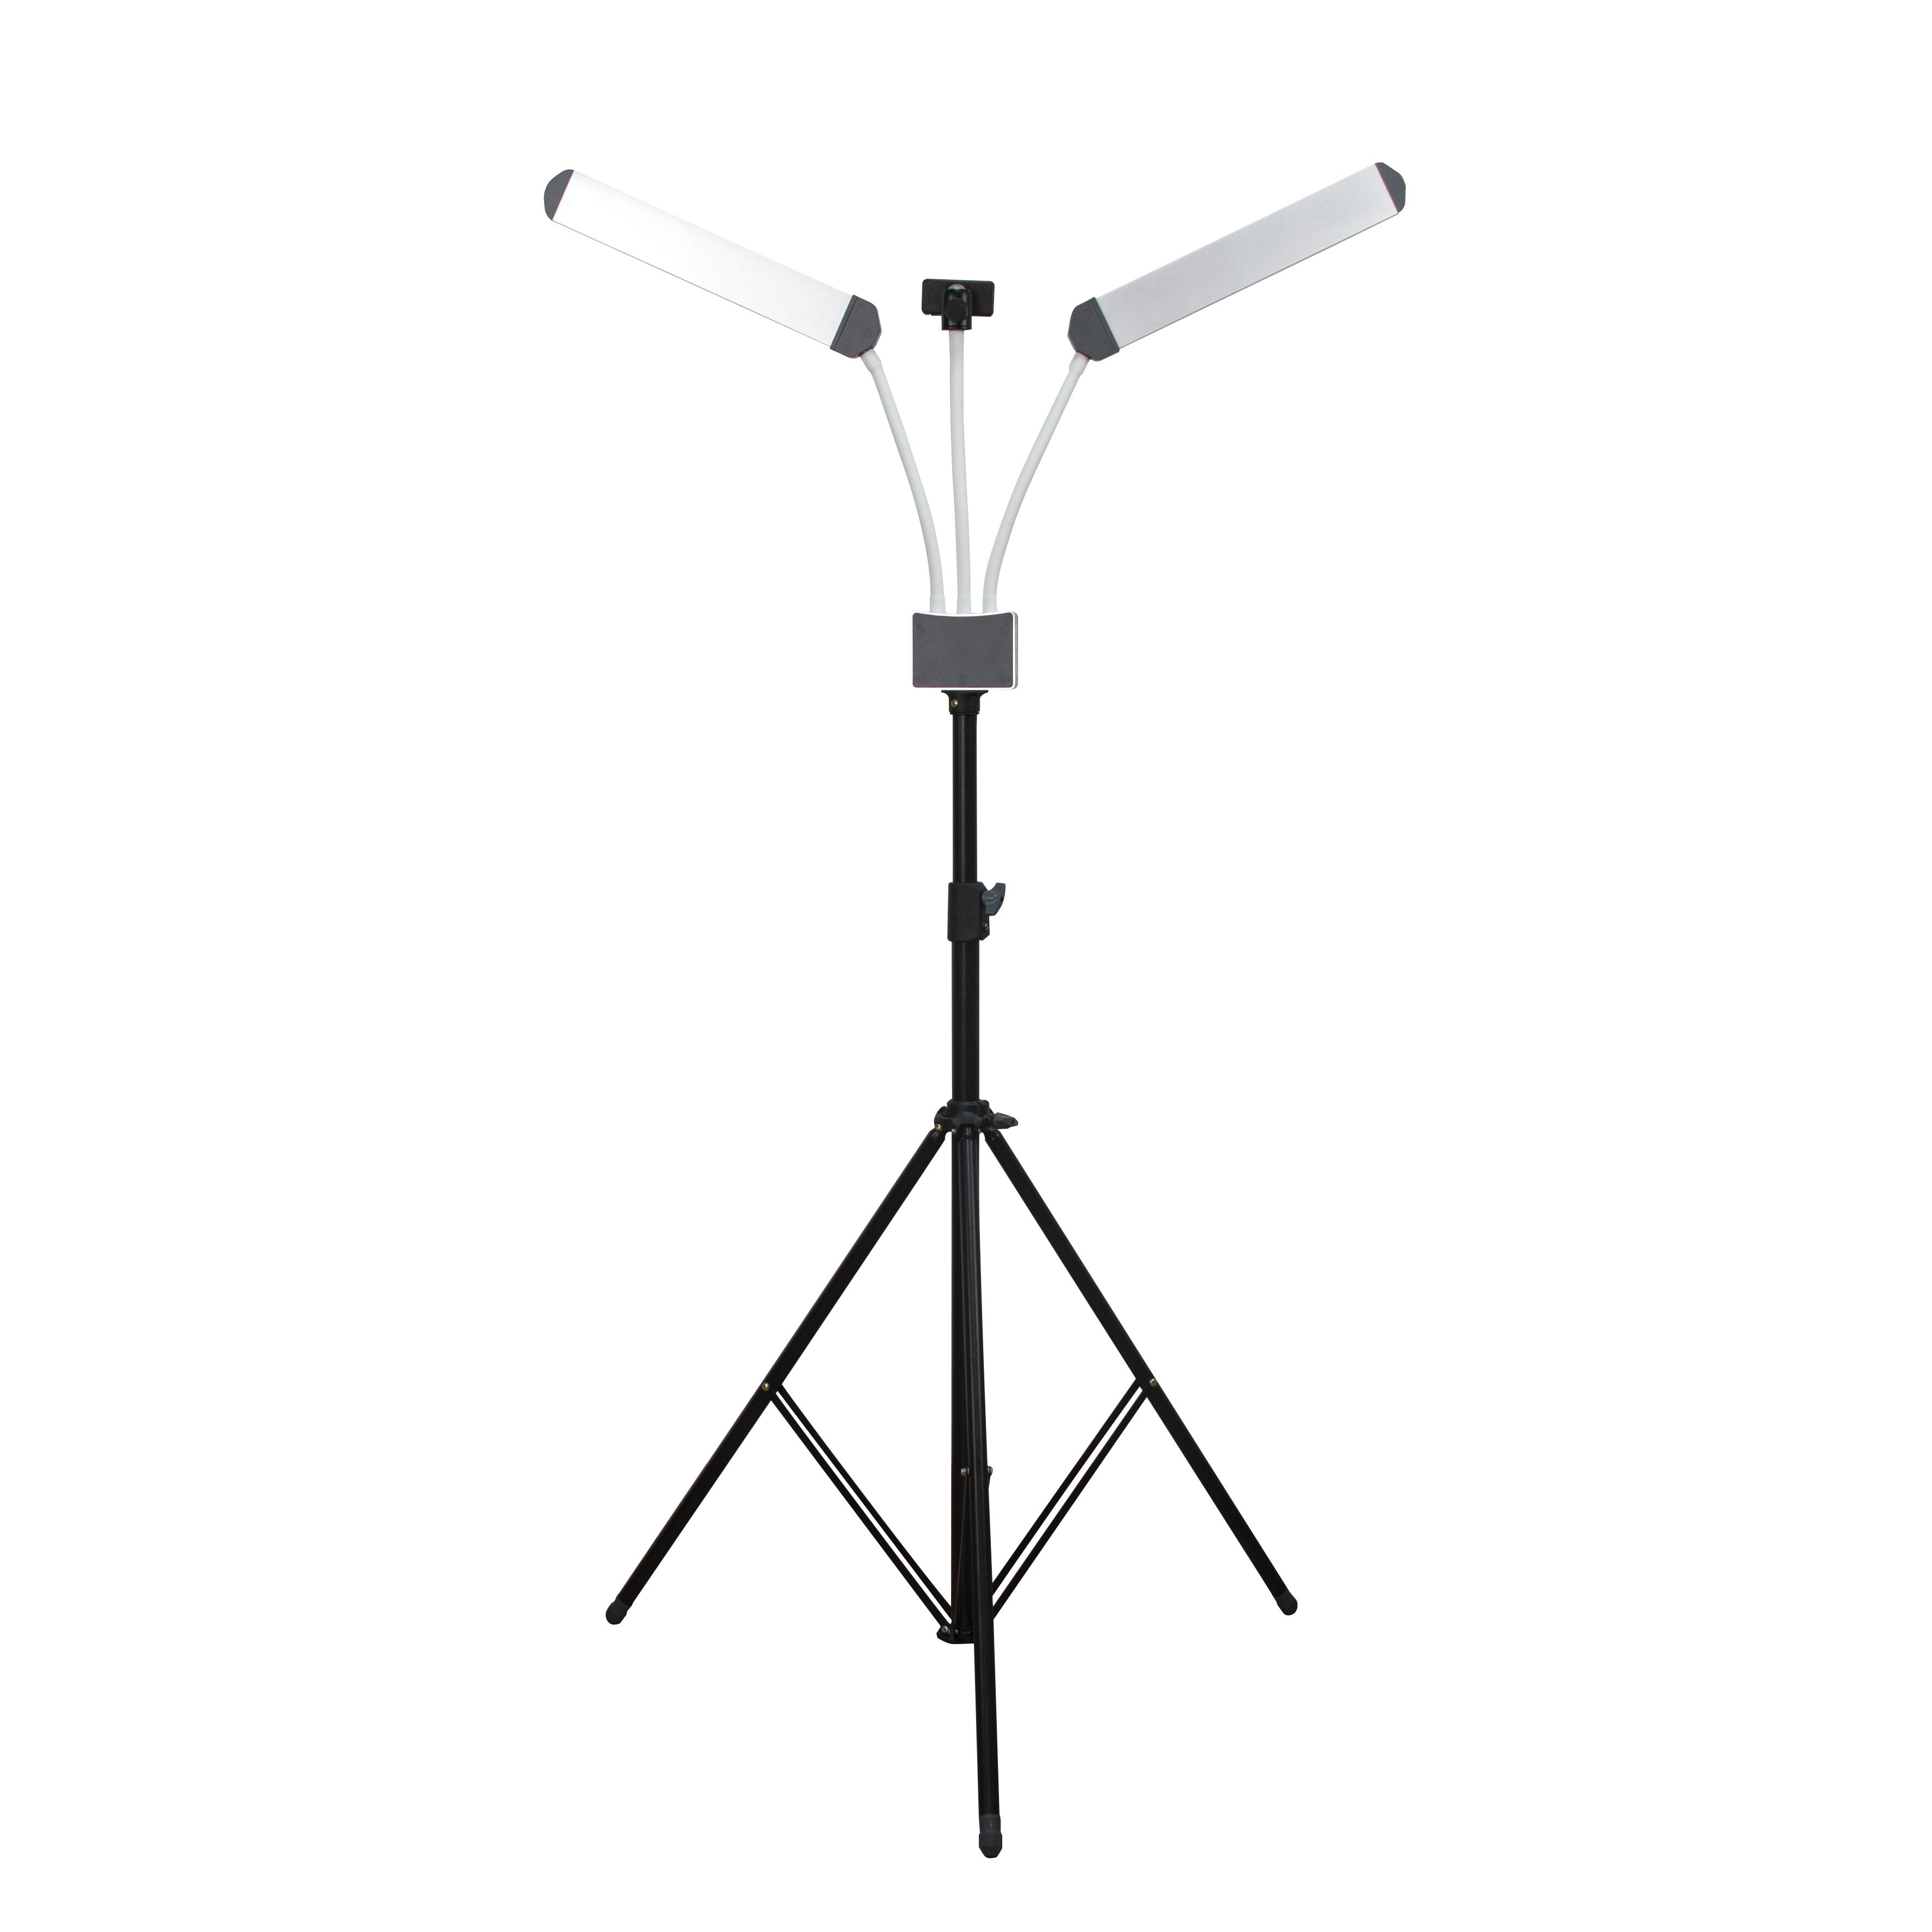 Professional Salon/Spa อิเล็กทรอนิกส์ Eyelash Light ความงาม LED โคมไฟสำหรับ Eyelash Extension